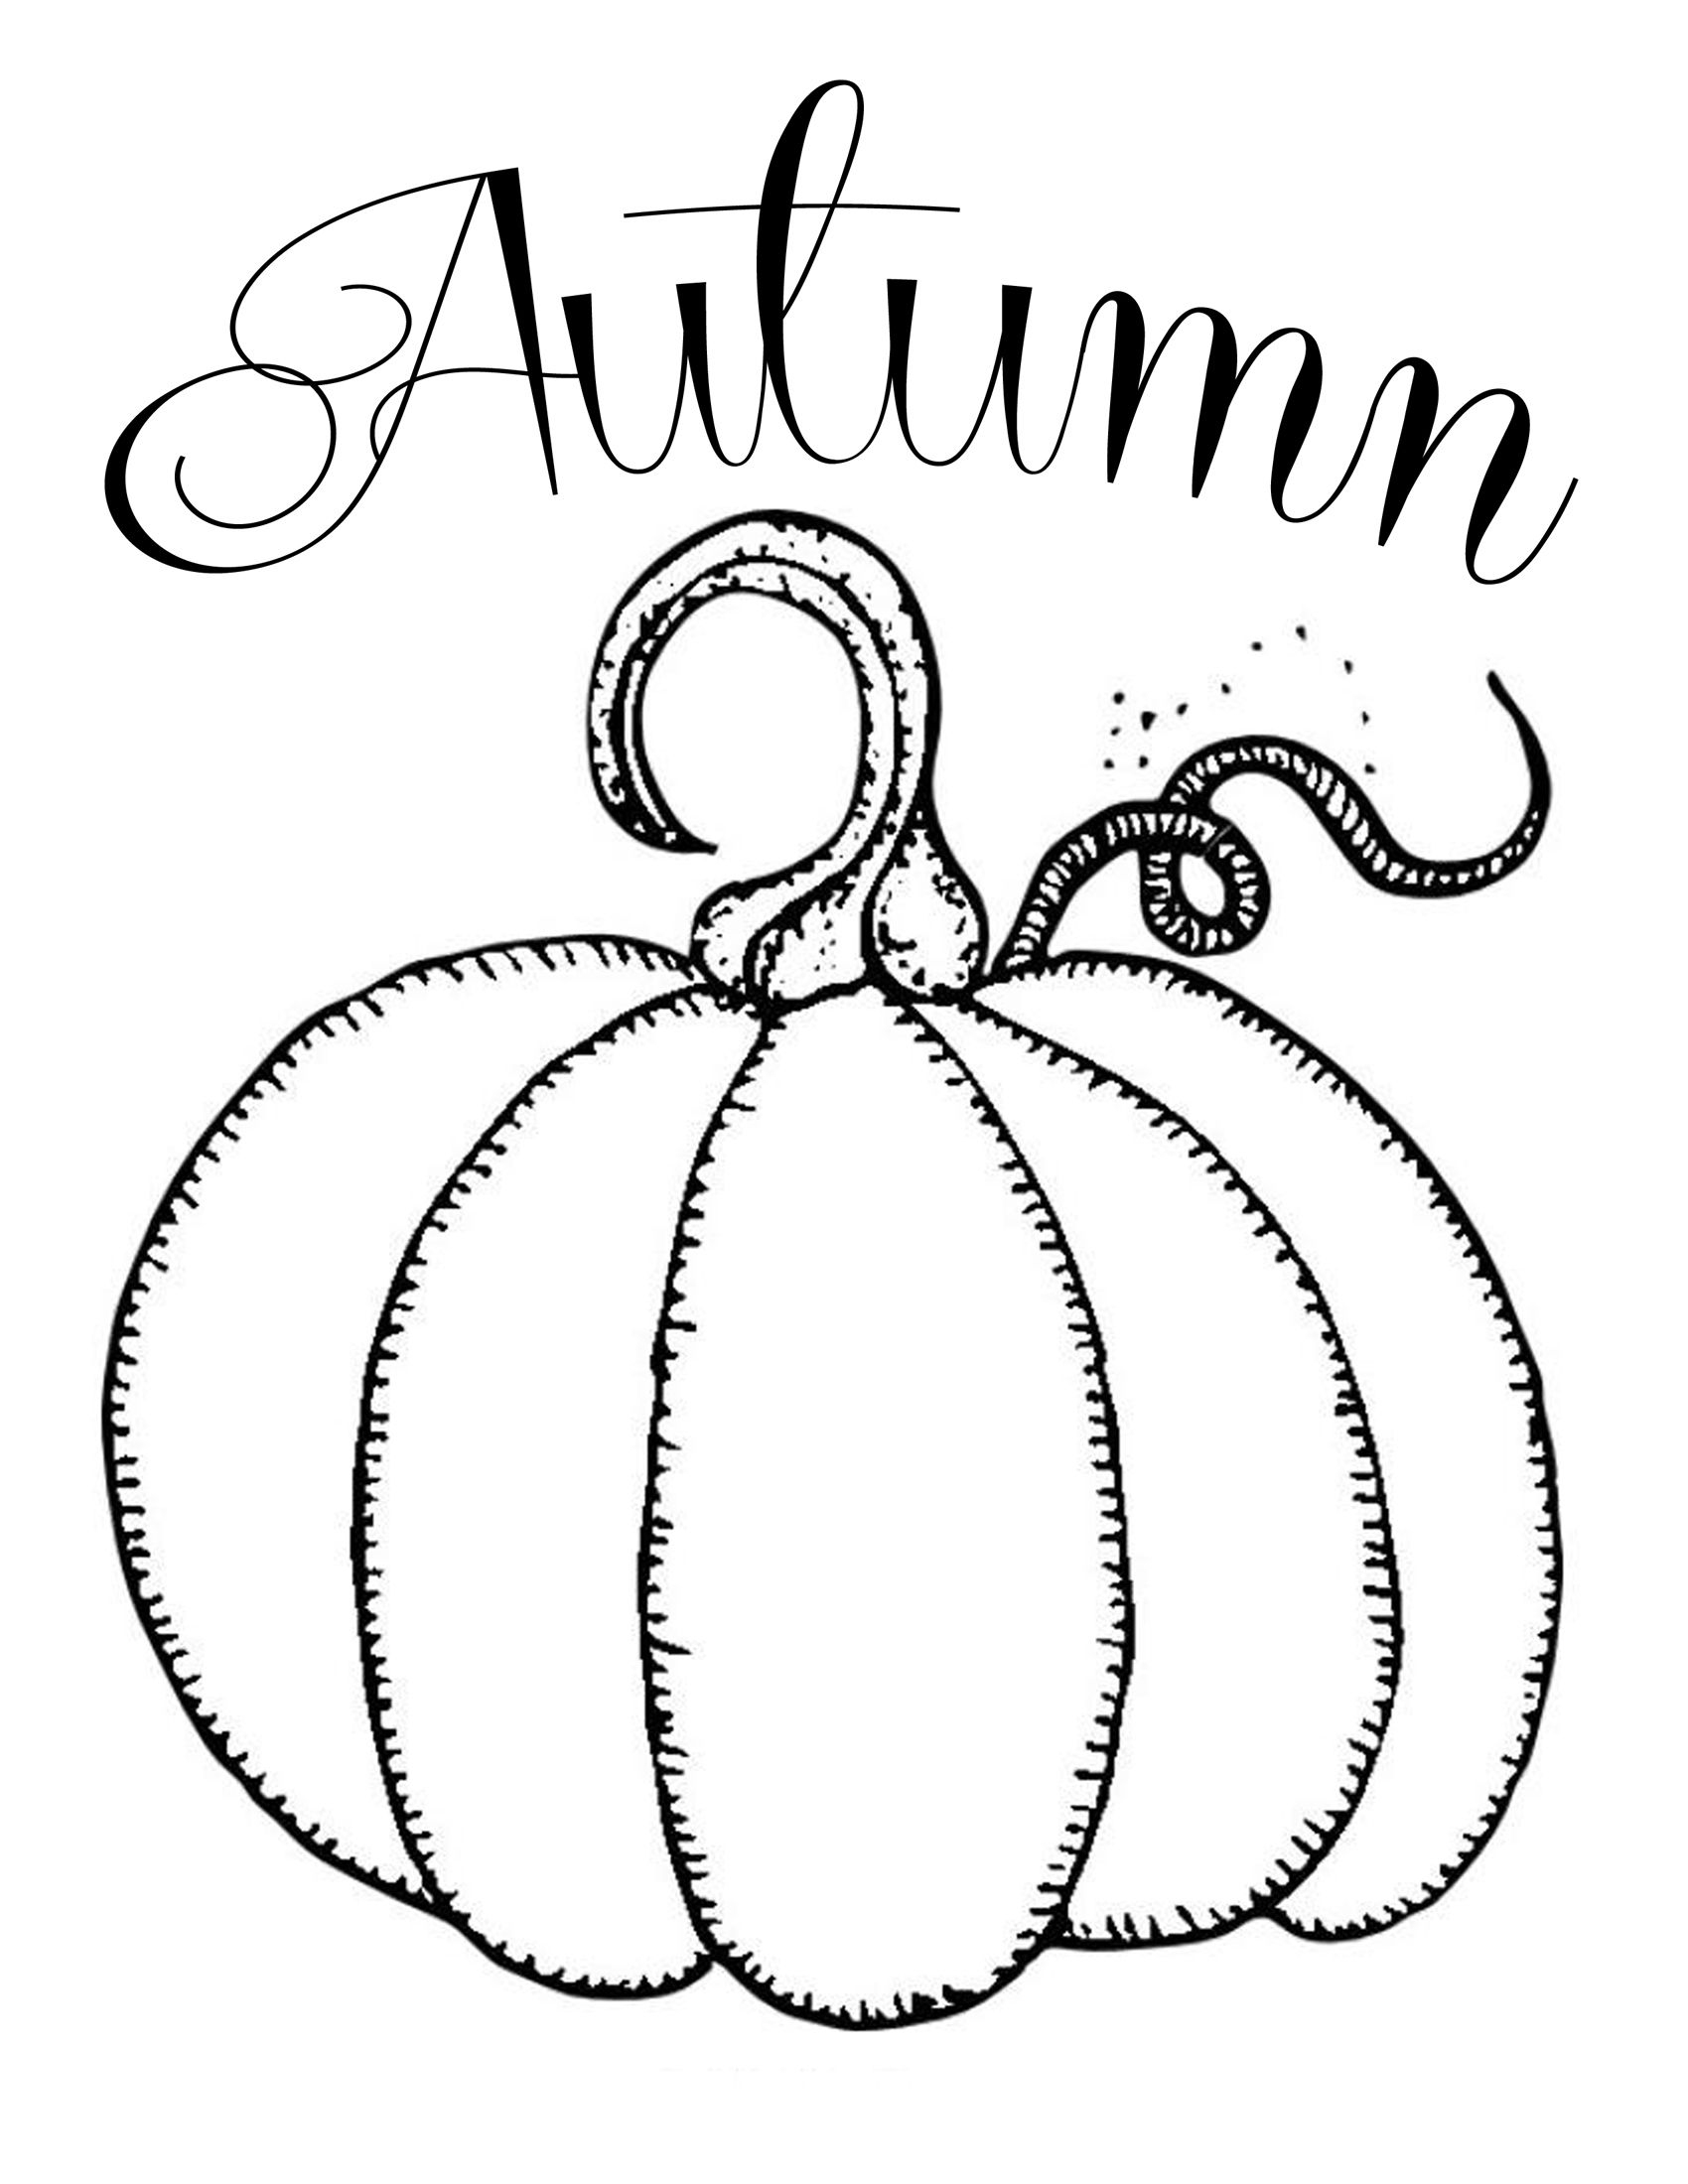 Free Printables ~ Chalkboard Autumn Pumpkin | Fonts And Printables - Free Printable Pumpkin Books